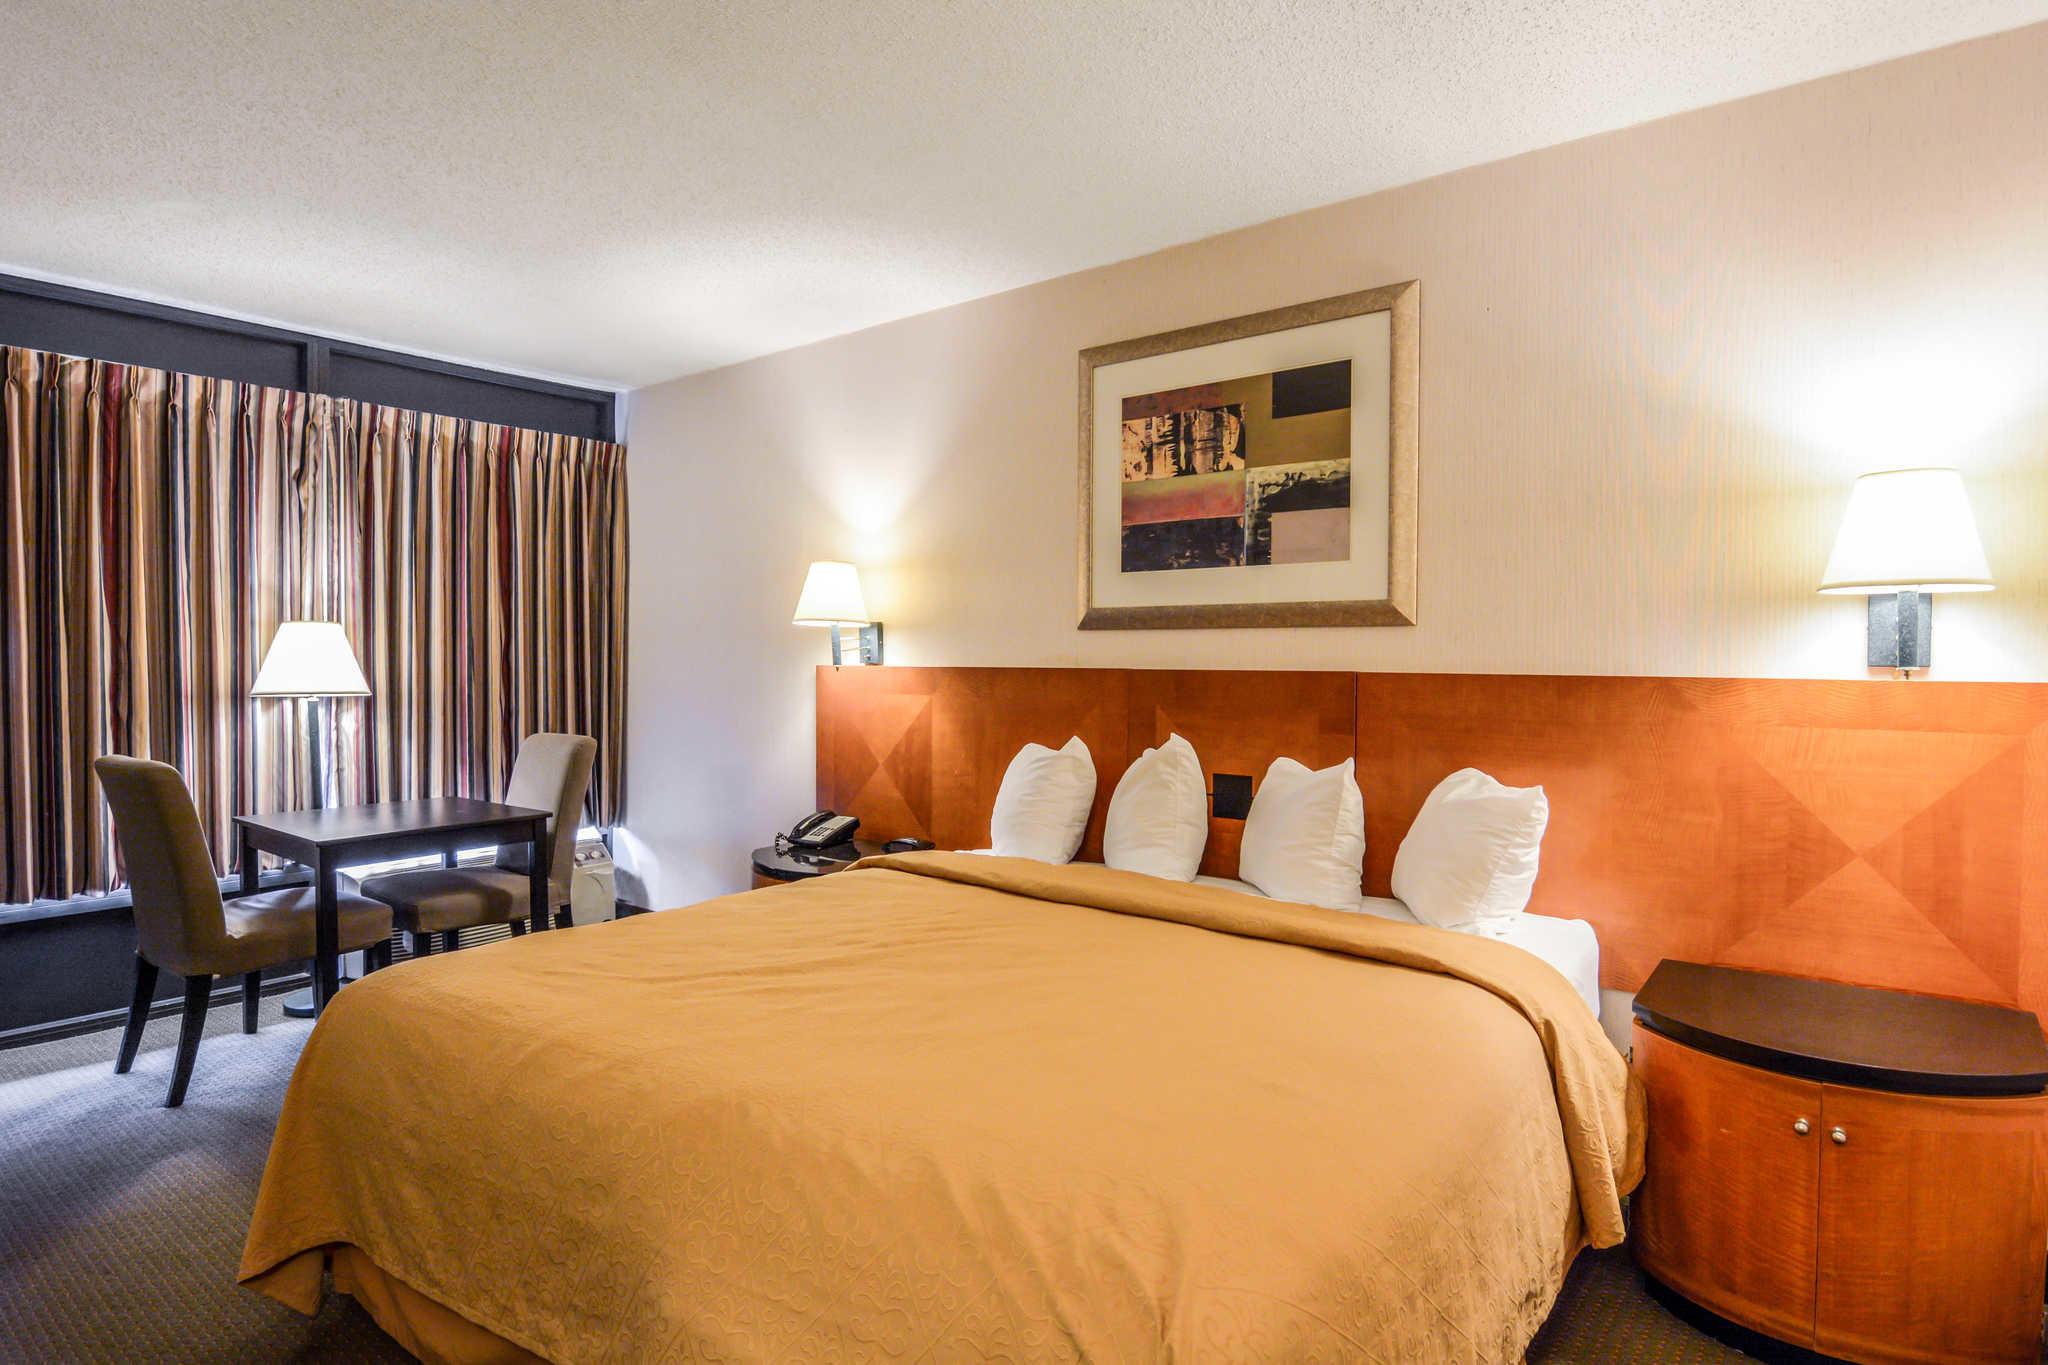 Quality Inn Skyline Drive image 16